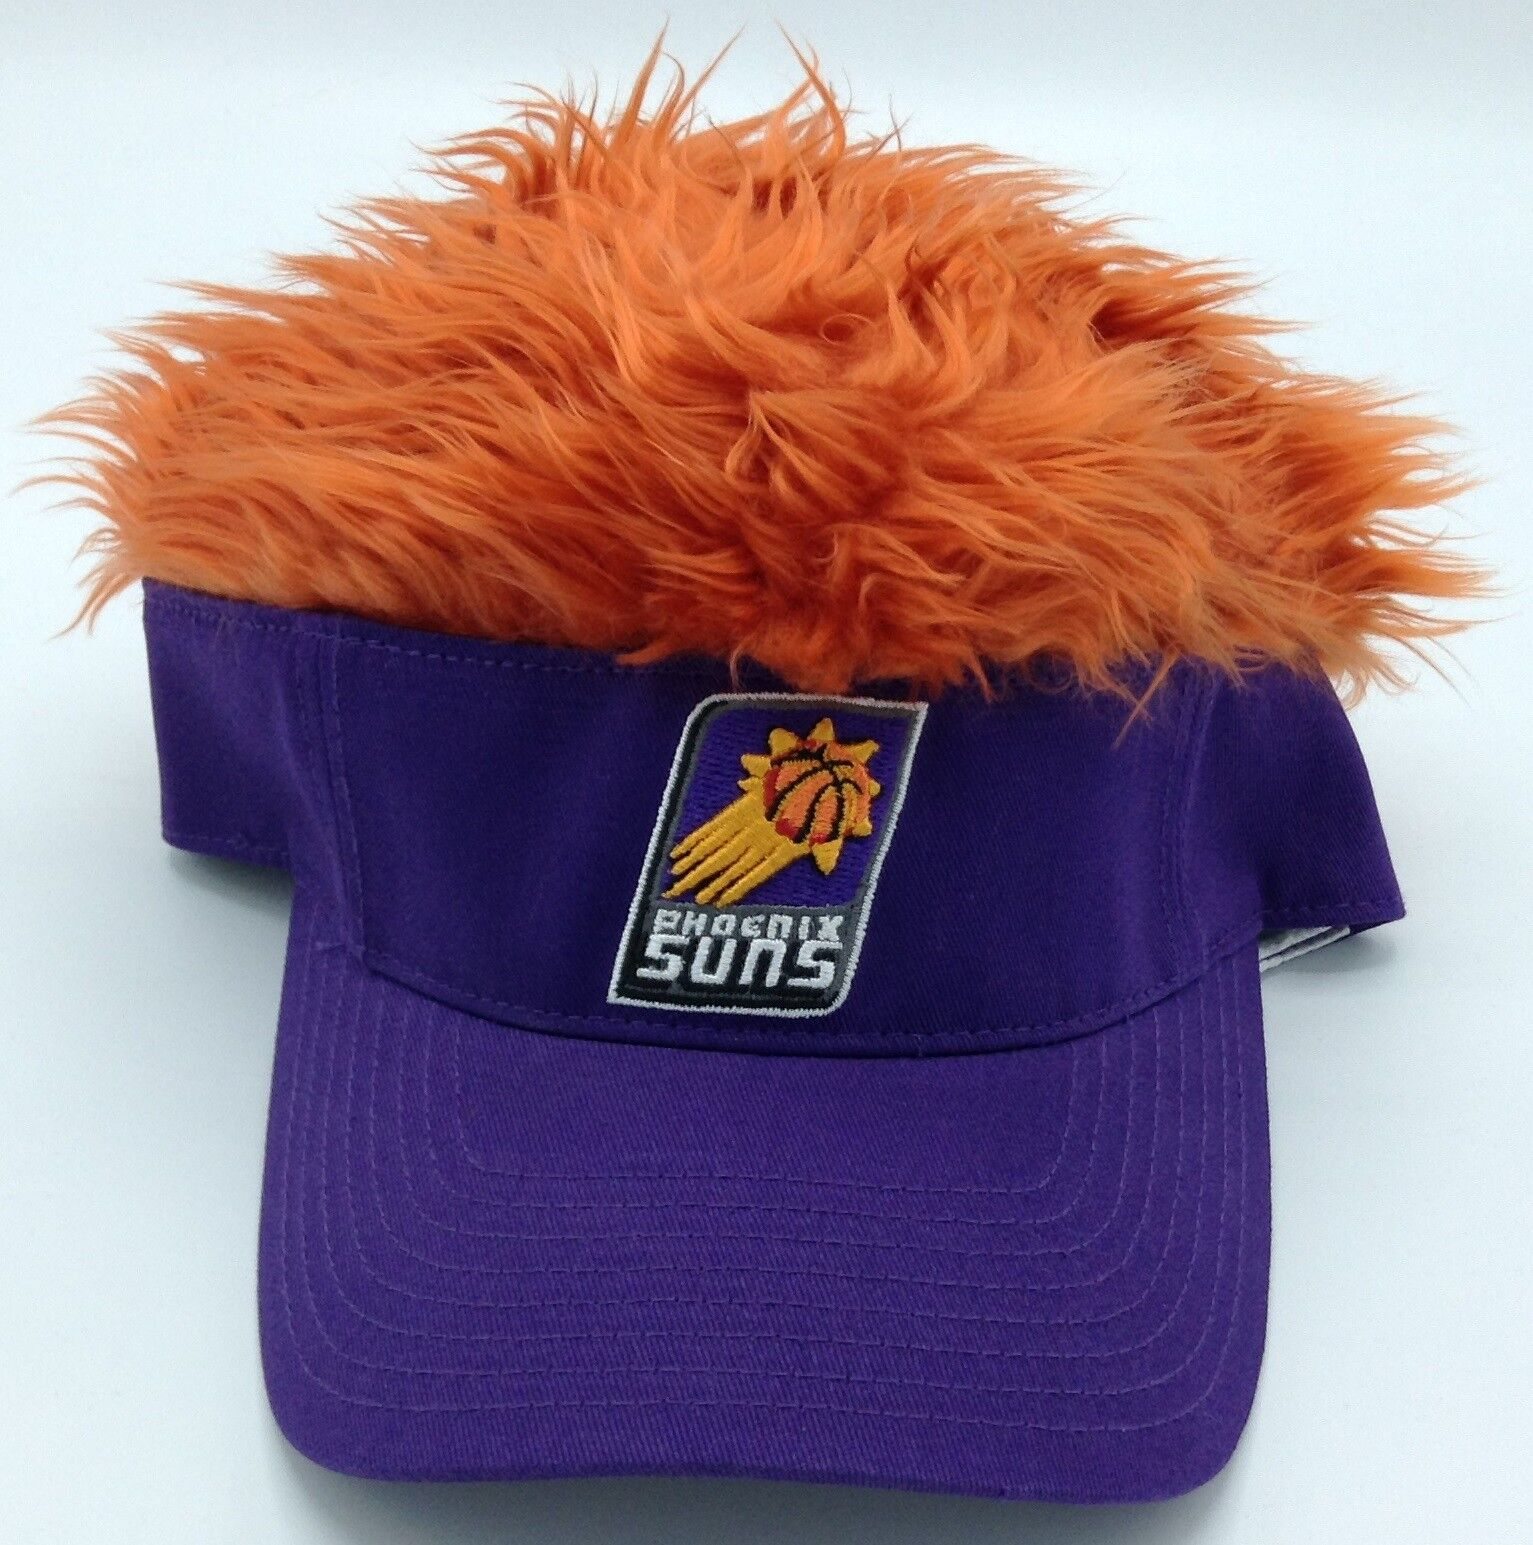 NBA Phoenix Suns Erwachsene Strukturiert Stretch Fit Fit Fit Fuzzy Top Kappe 39799e